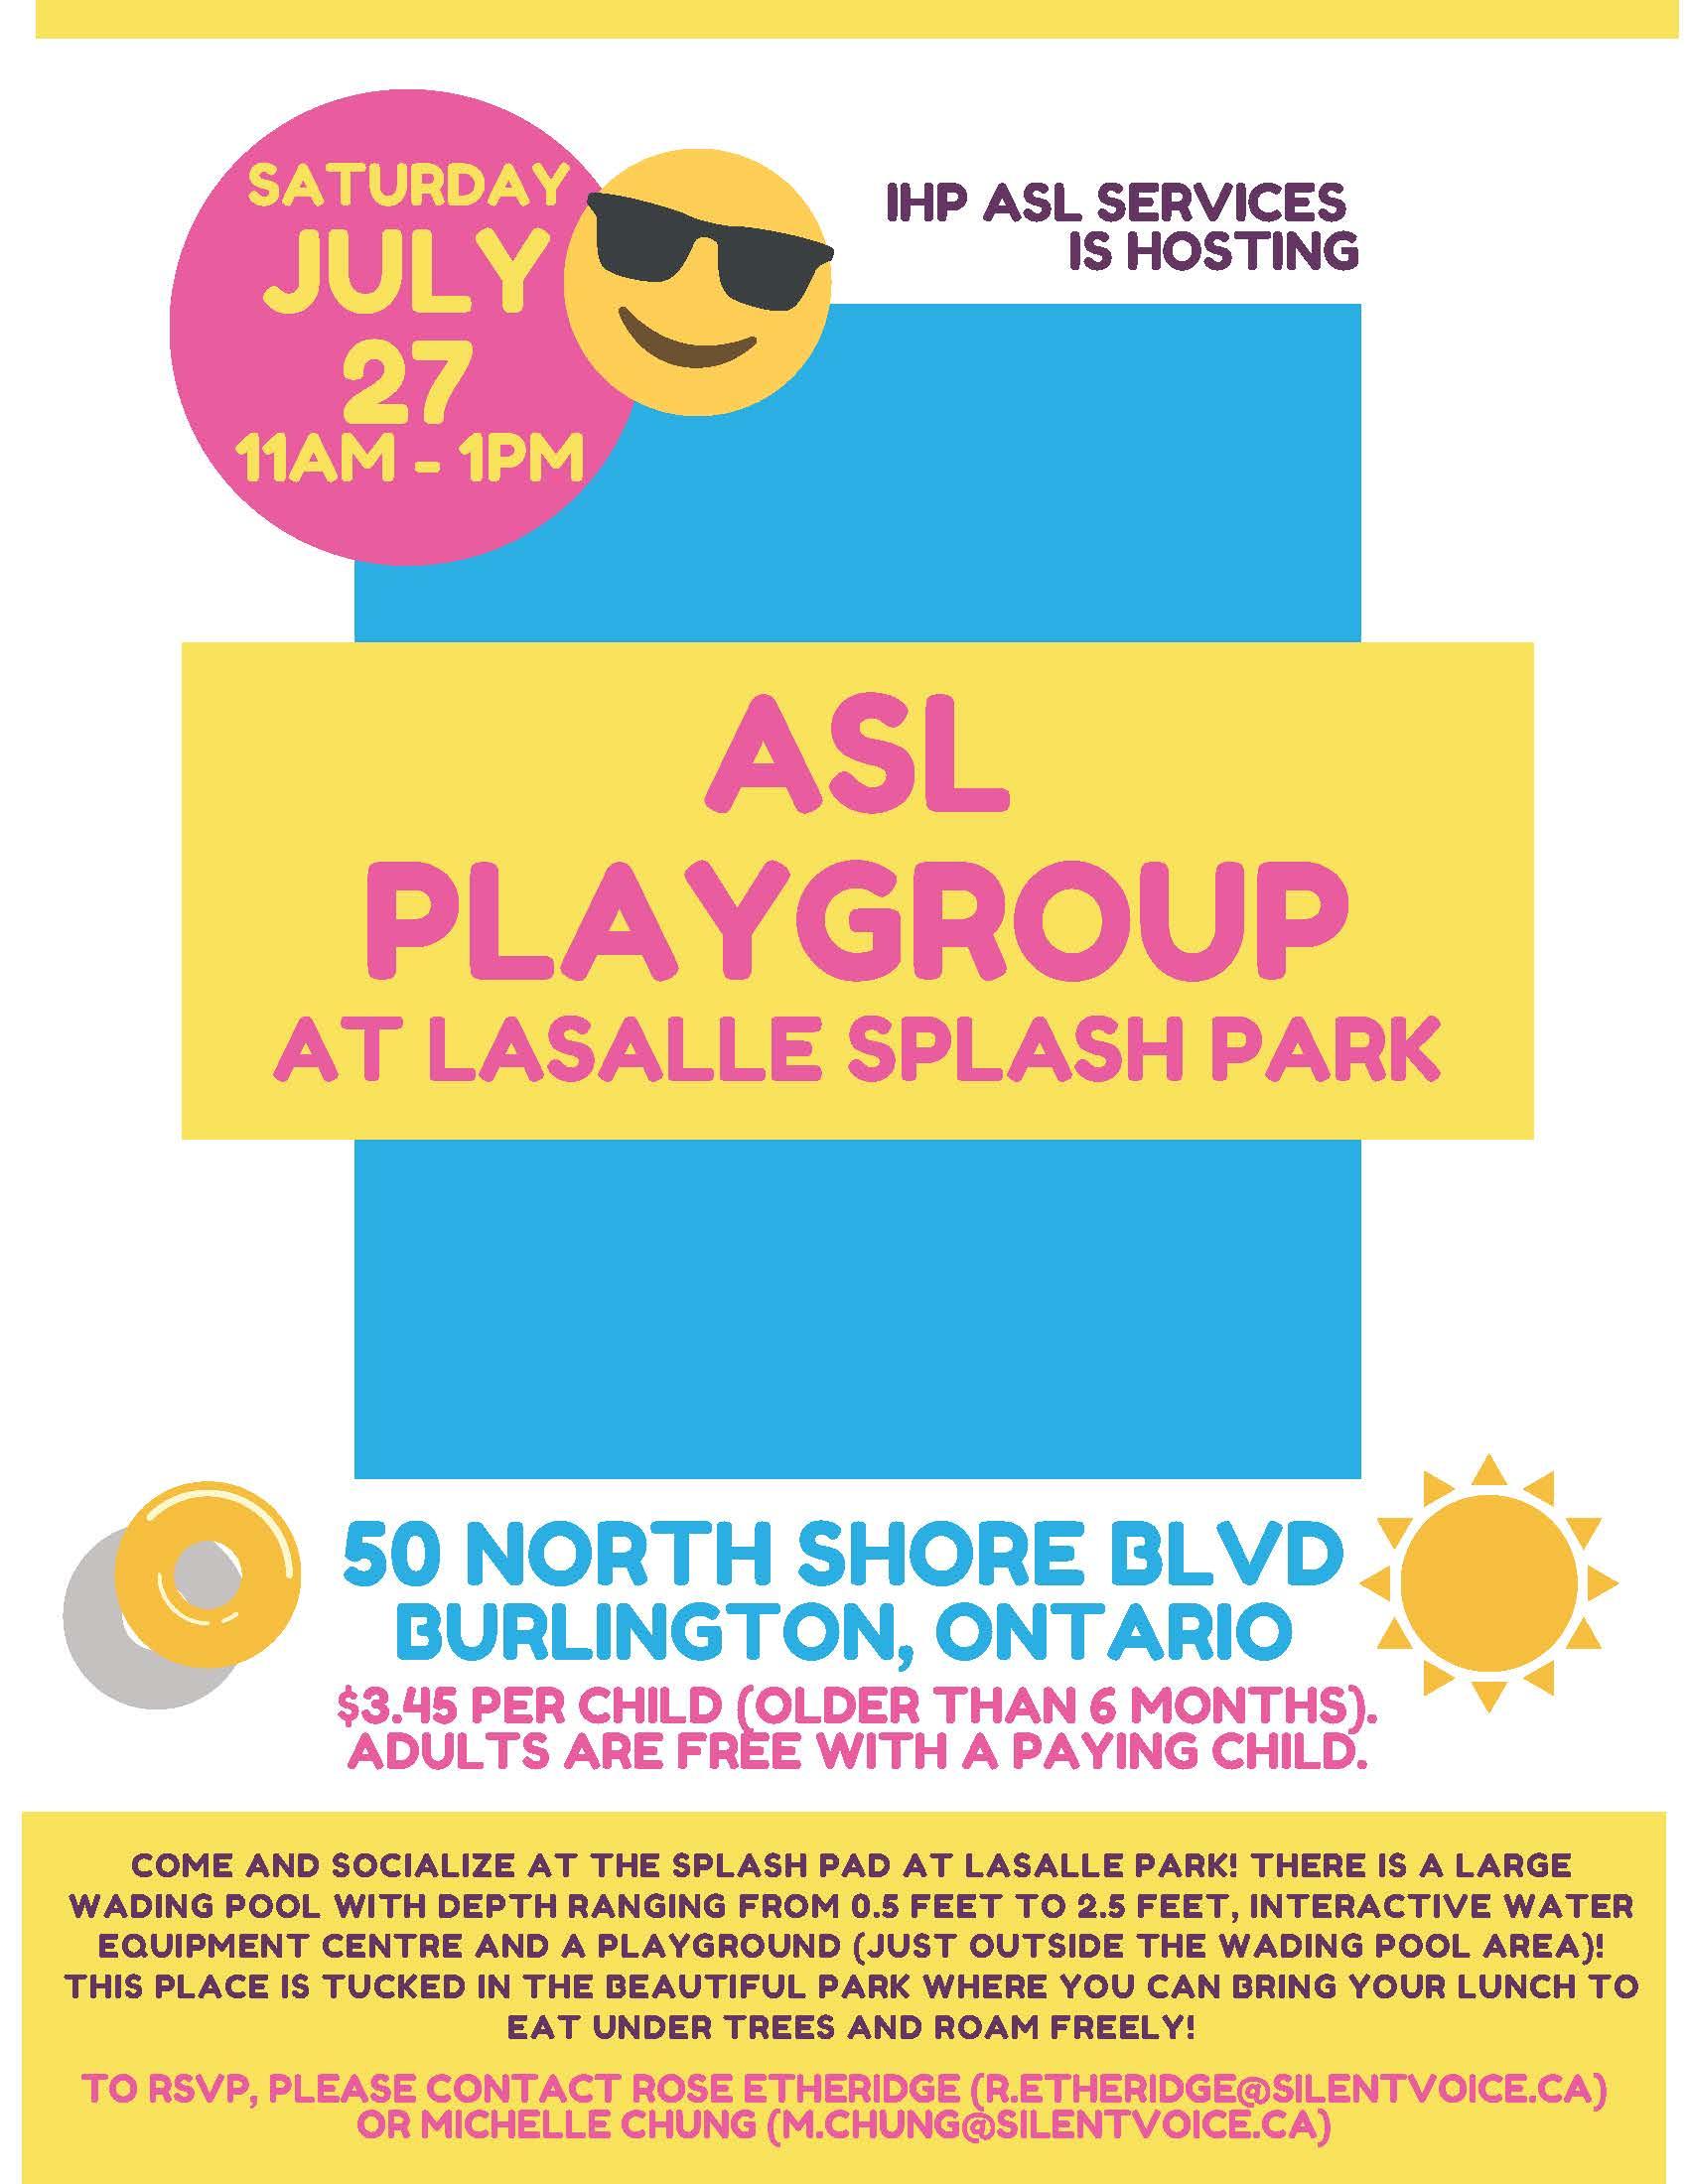 ASL Playgroup at Lasalle Splash Park - flyer